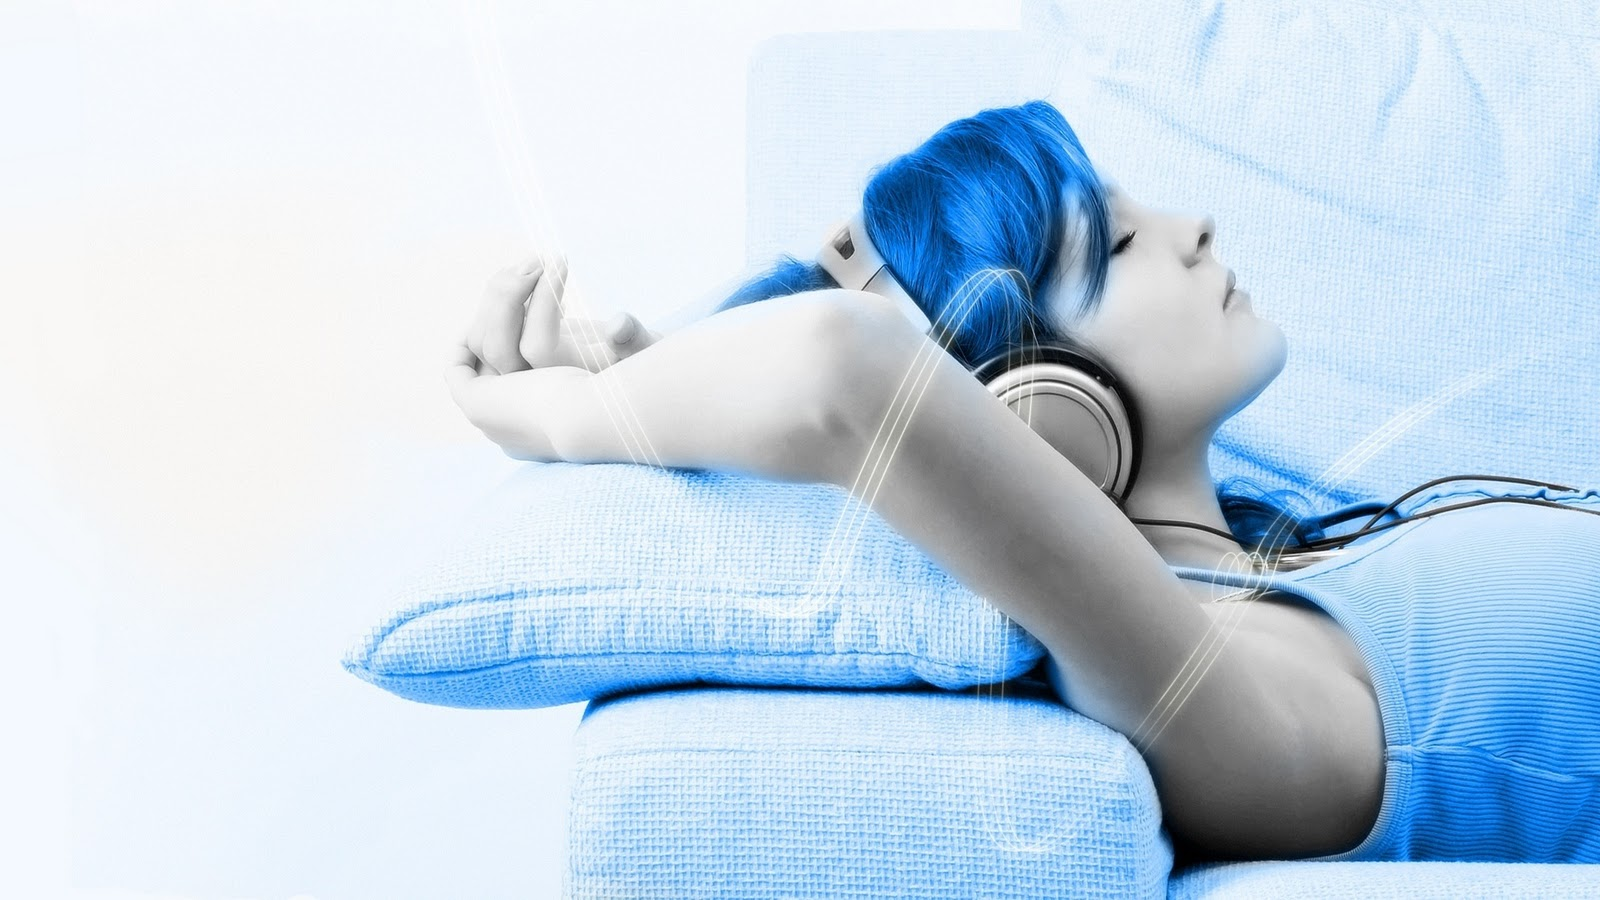 http://4.bp.blogspot.com/-G0e75hPj0VI/UC45rkBuu3I/AAAAAAAABug/KPcyInyT0SQ/s1600/Cute-Girl-Blue-Hair-Headphone-Abstract-HD-Wallpaper-FreeHDWall.Blogspot.Com_.jpg